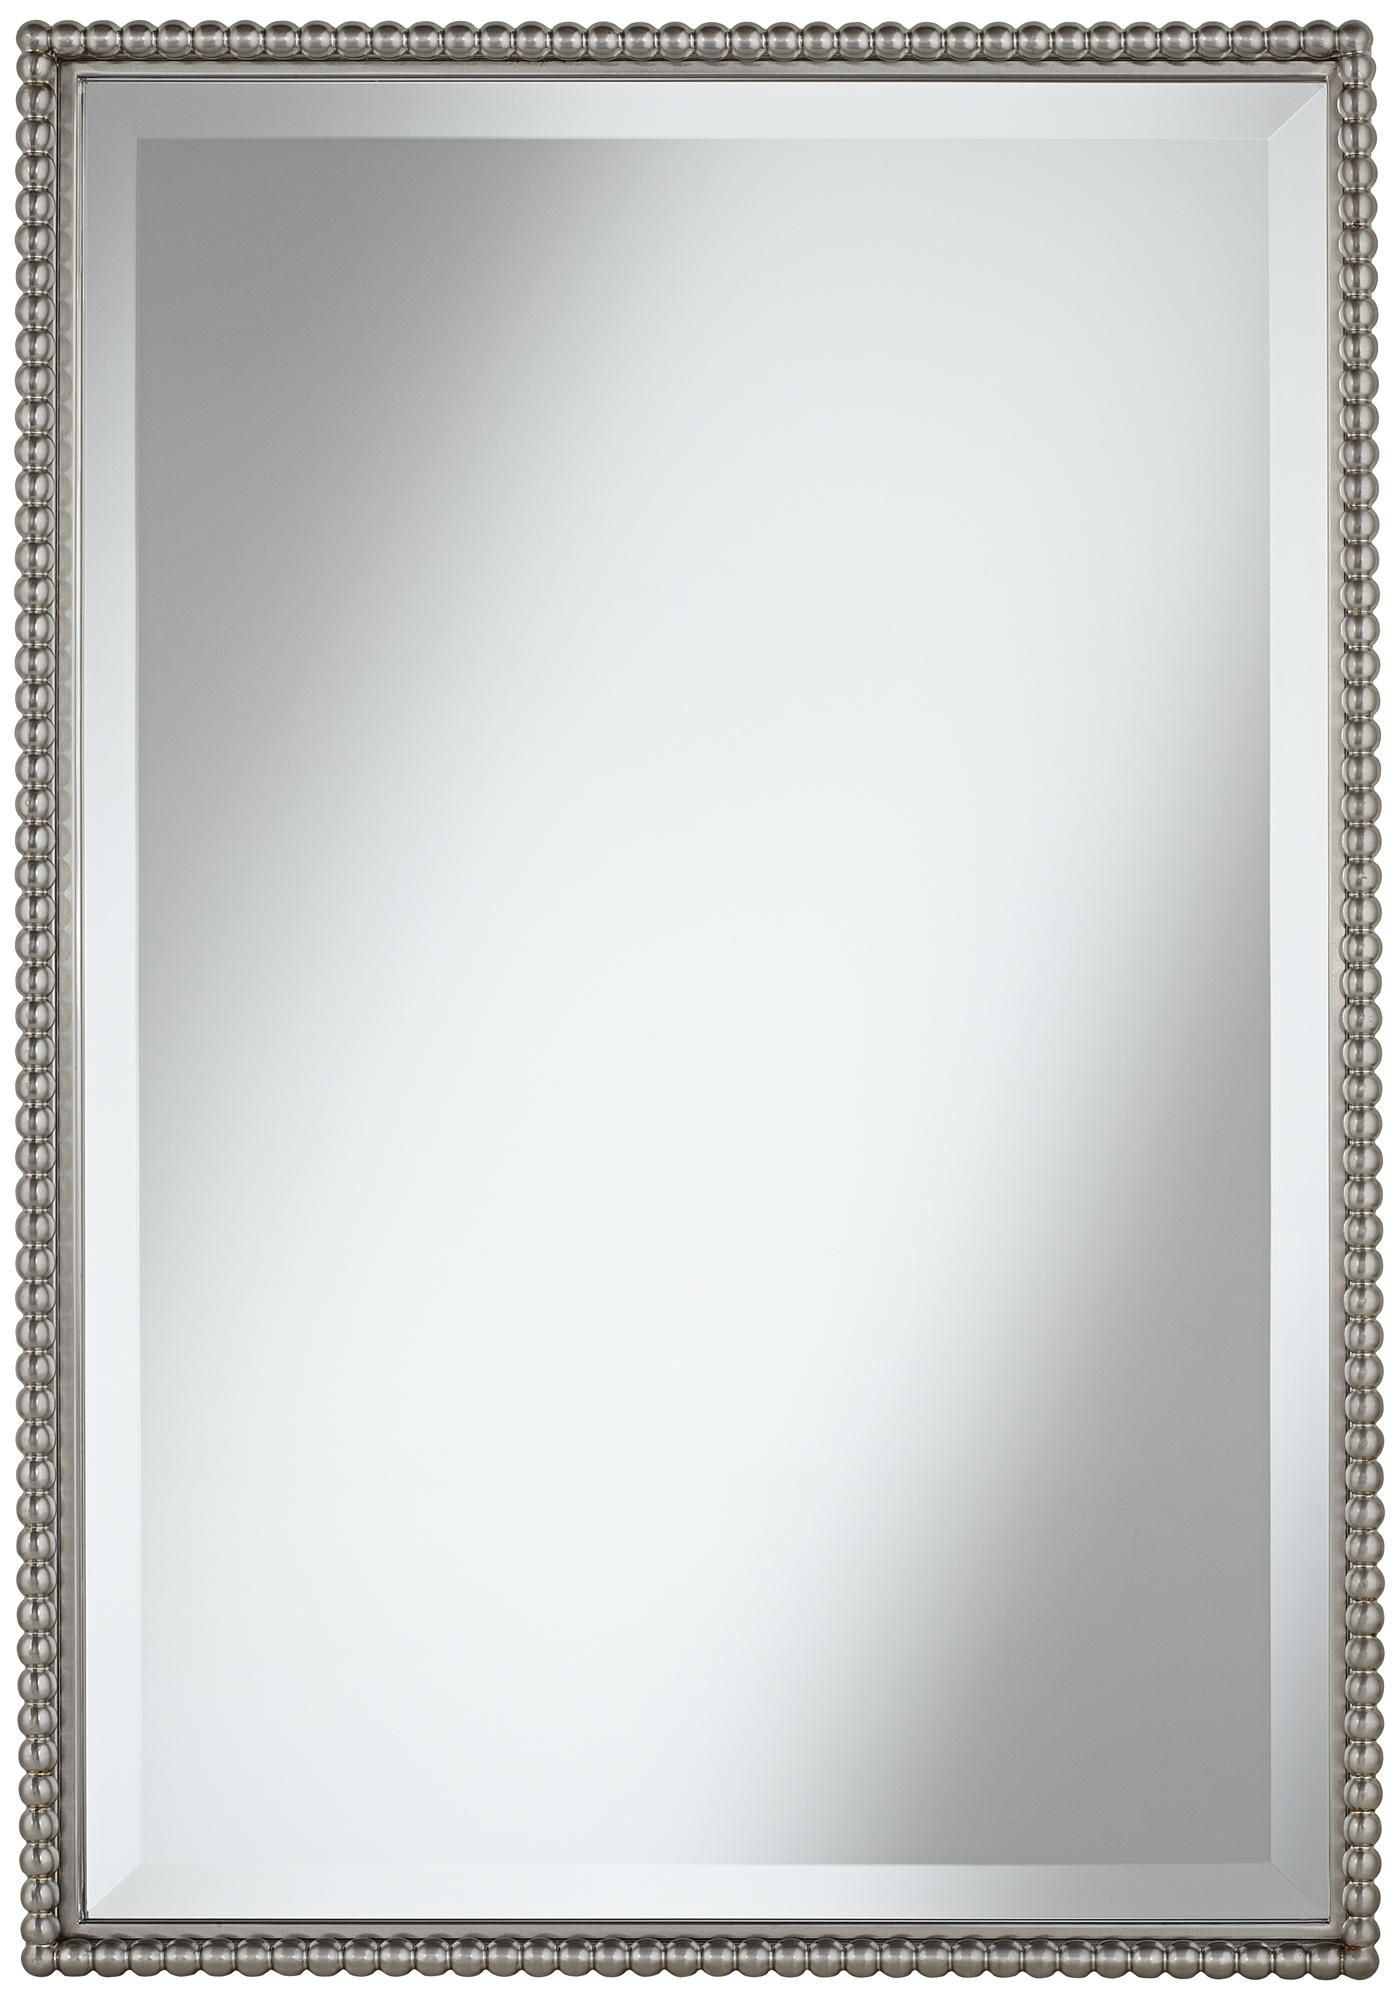 Uttermost Sherise Beaded 31 High Rectangular Wall Mirror Brushed Nickel MirrorMaster BathroomsWall MirrorsMasters